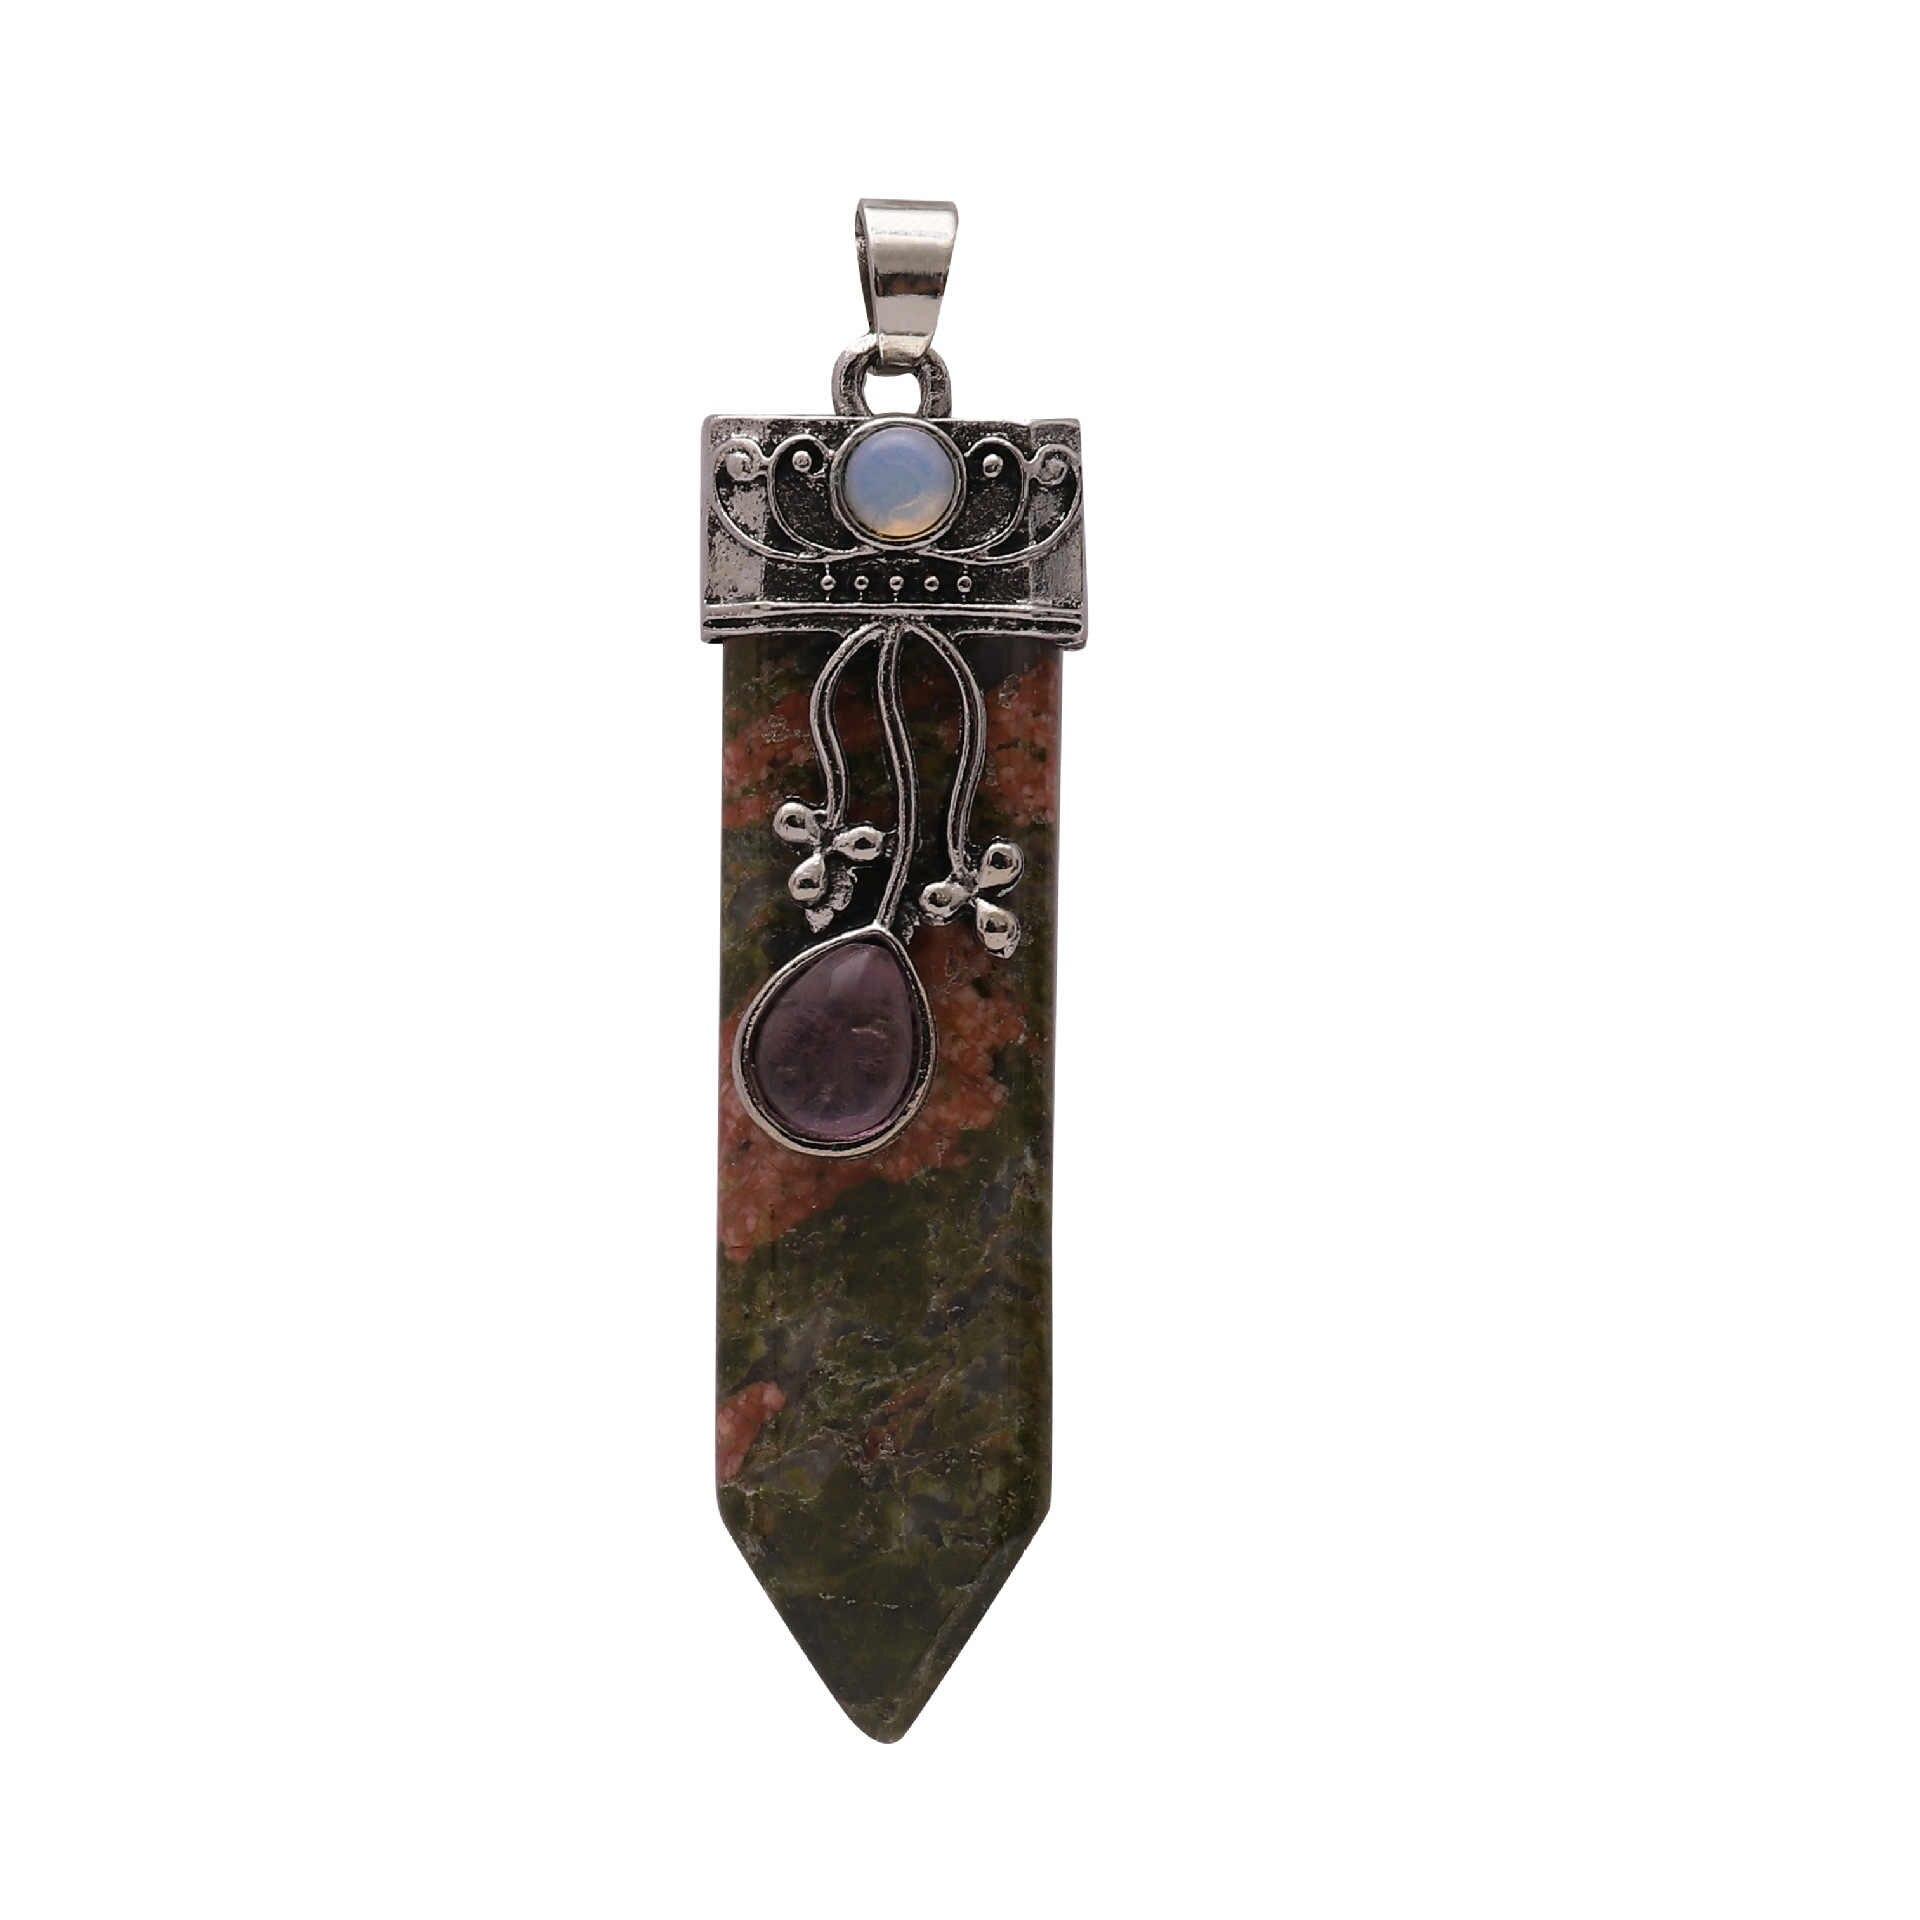 Vintage Silver Plated Healing Arrow ลูกตุ้มโอปอลคริสตัลธรรมชาติ Lapis Onyx Rose สีชมพูควอตซ์หินจี้แฟชั่นเครื่องประดับ